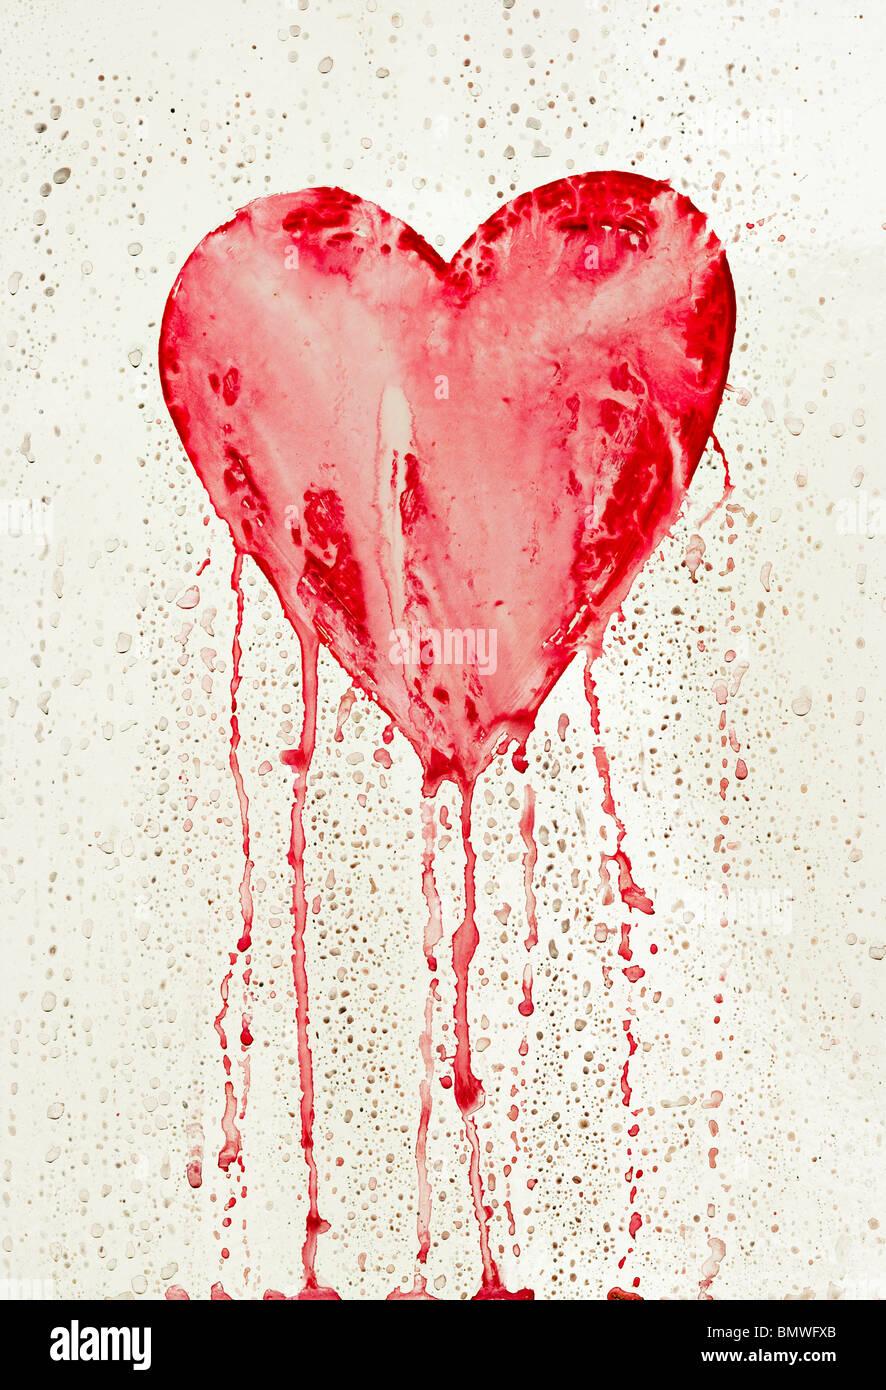 Bleeding Heart - symbole de l'amour Photo Stock